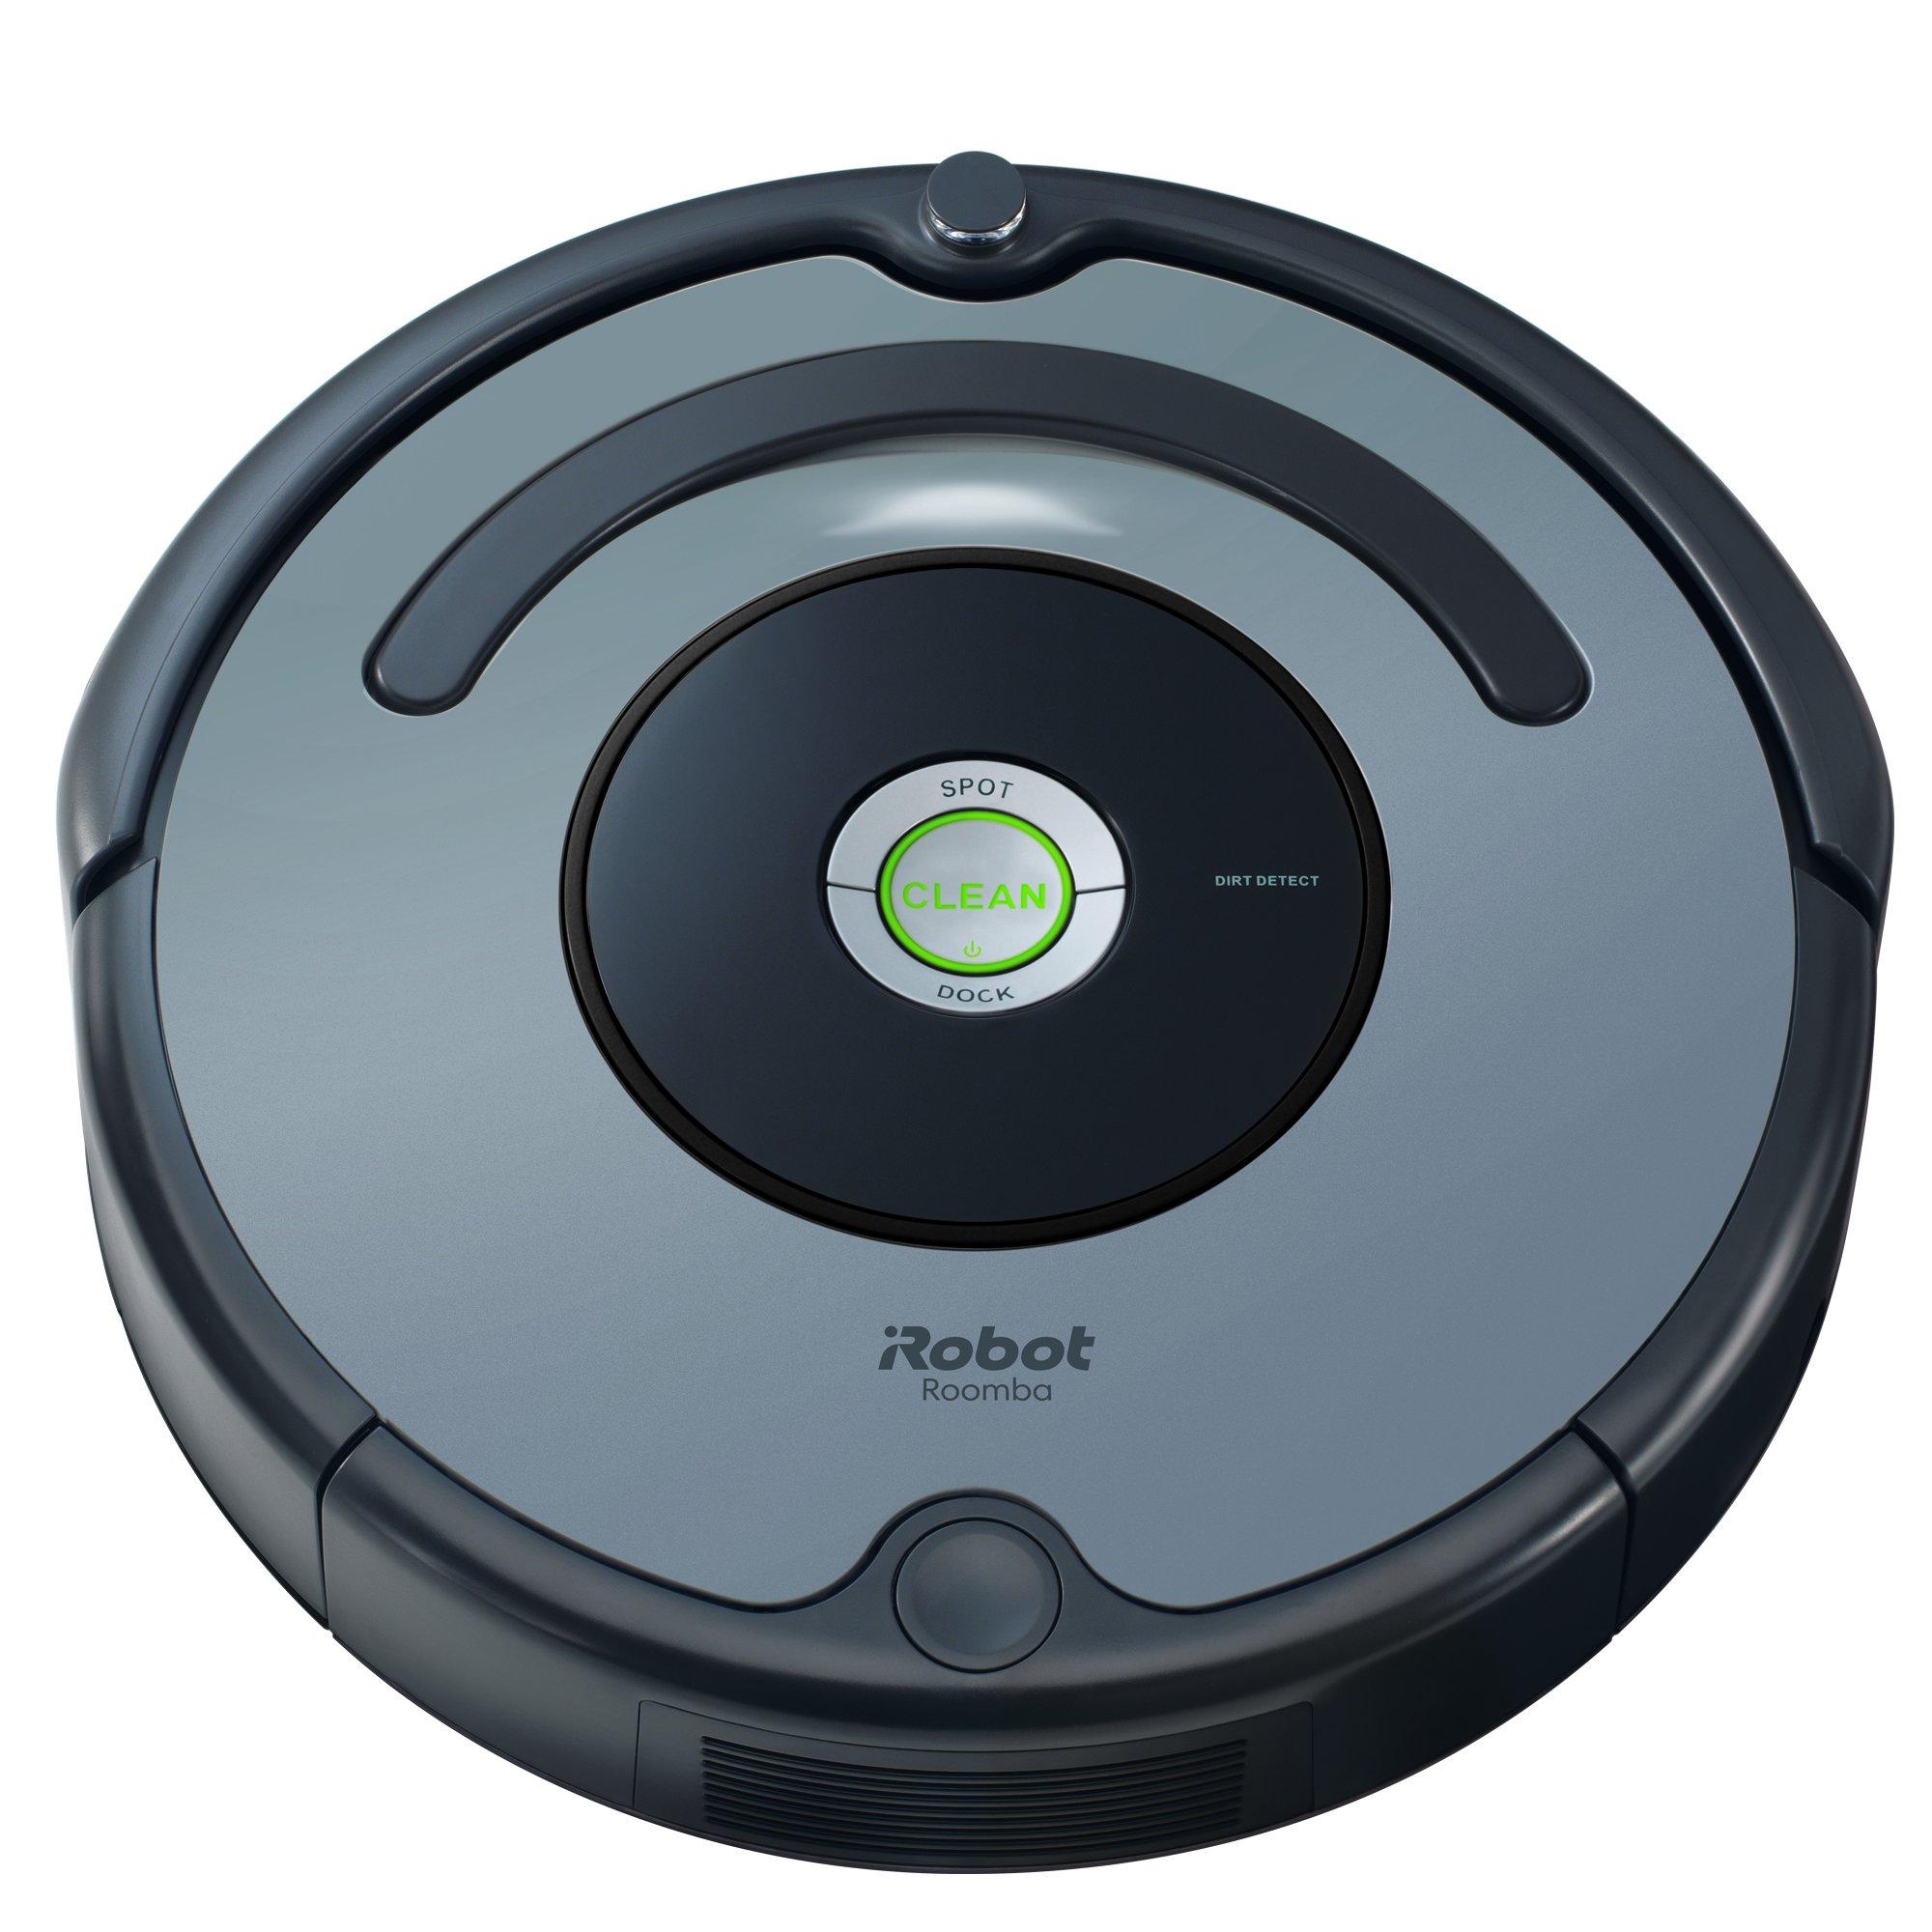 iRobot Roomba 640 Robot Vacuum Cleaner, Self-Charging, Good for Pet Hair, Carpets, & Hard Floor Surfaces, Grey by iRobot